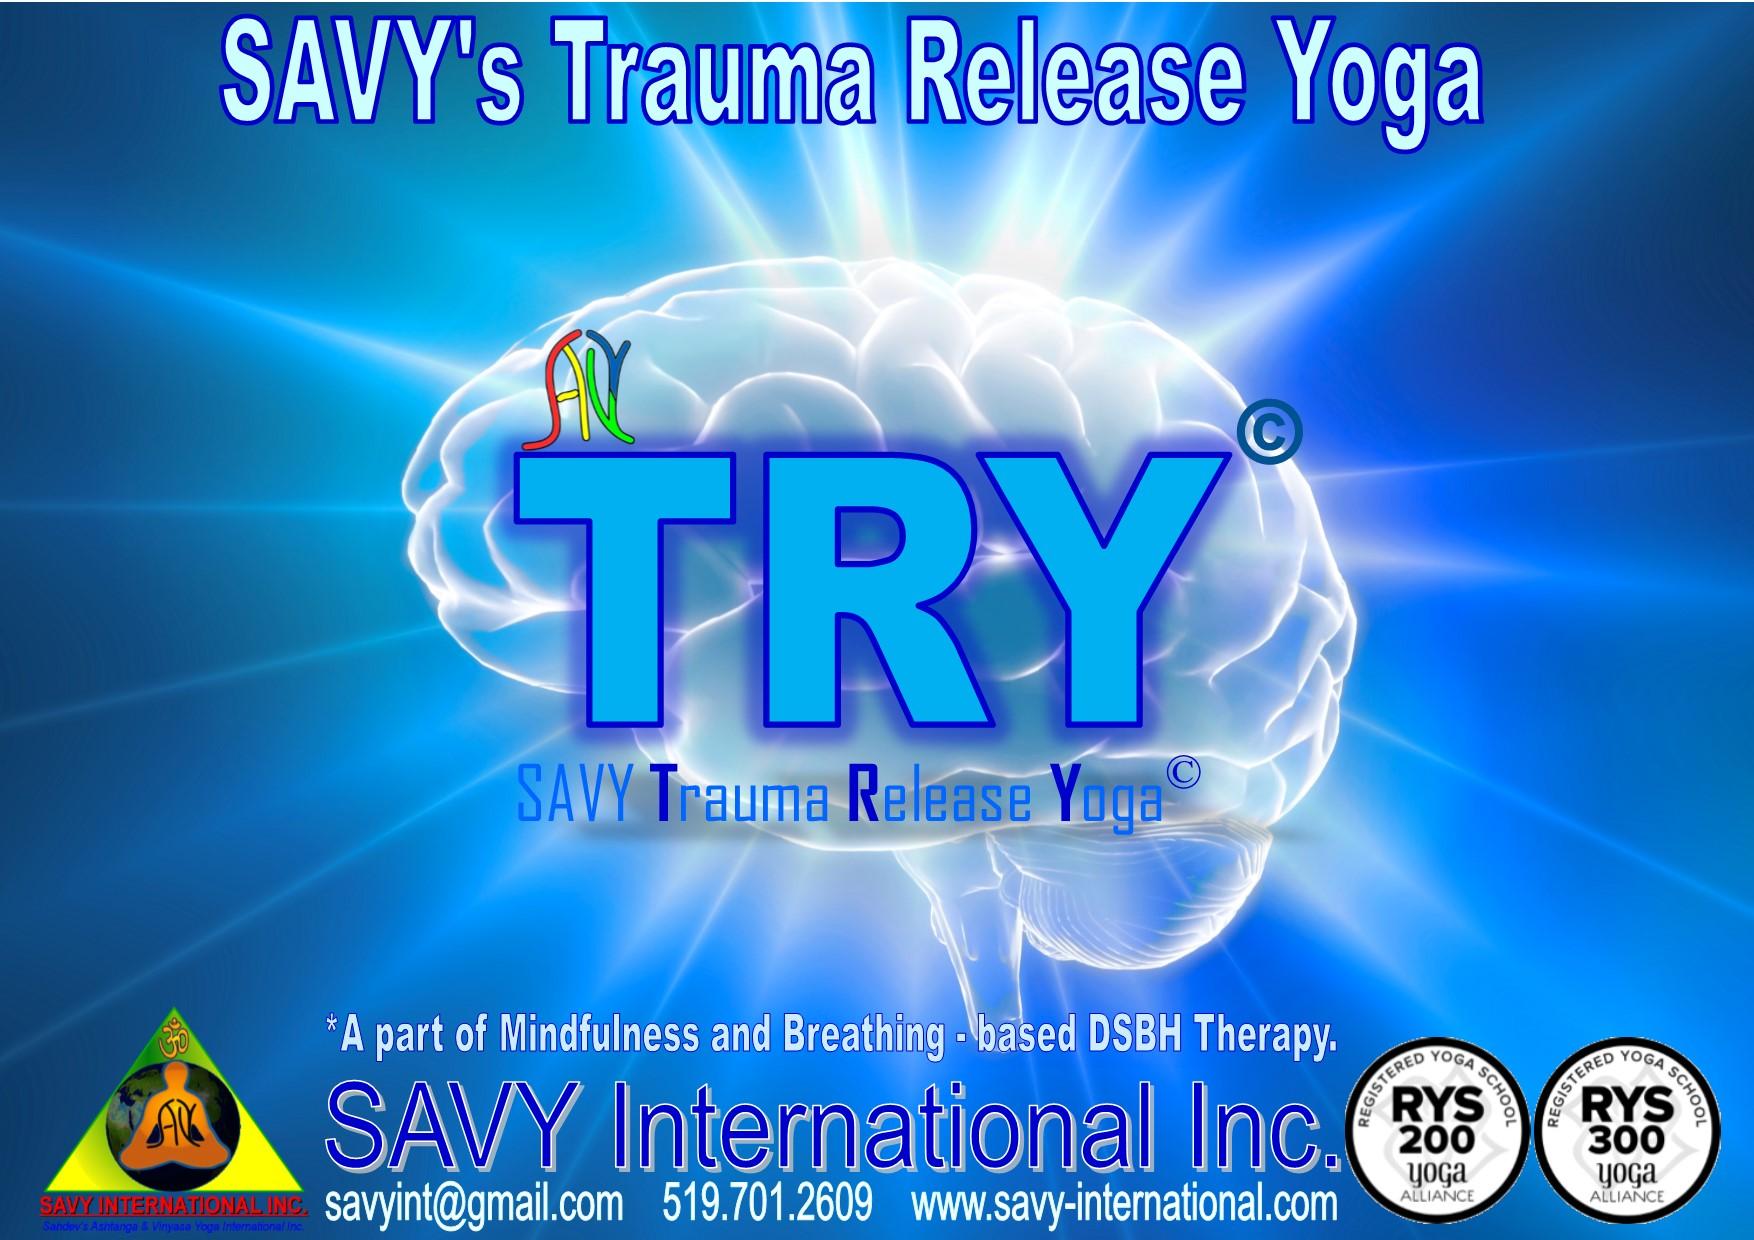 SAVY Trauma Release Yoga - Learn 7 Exercises